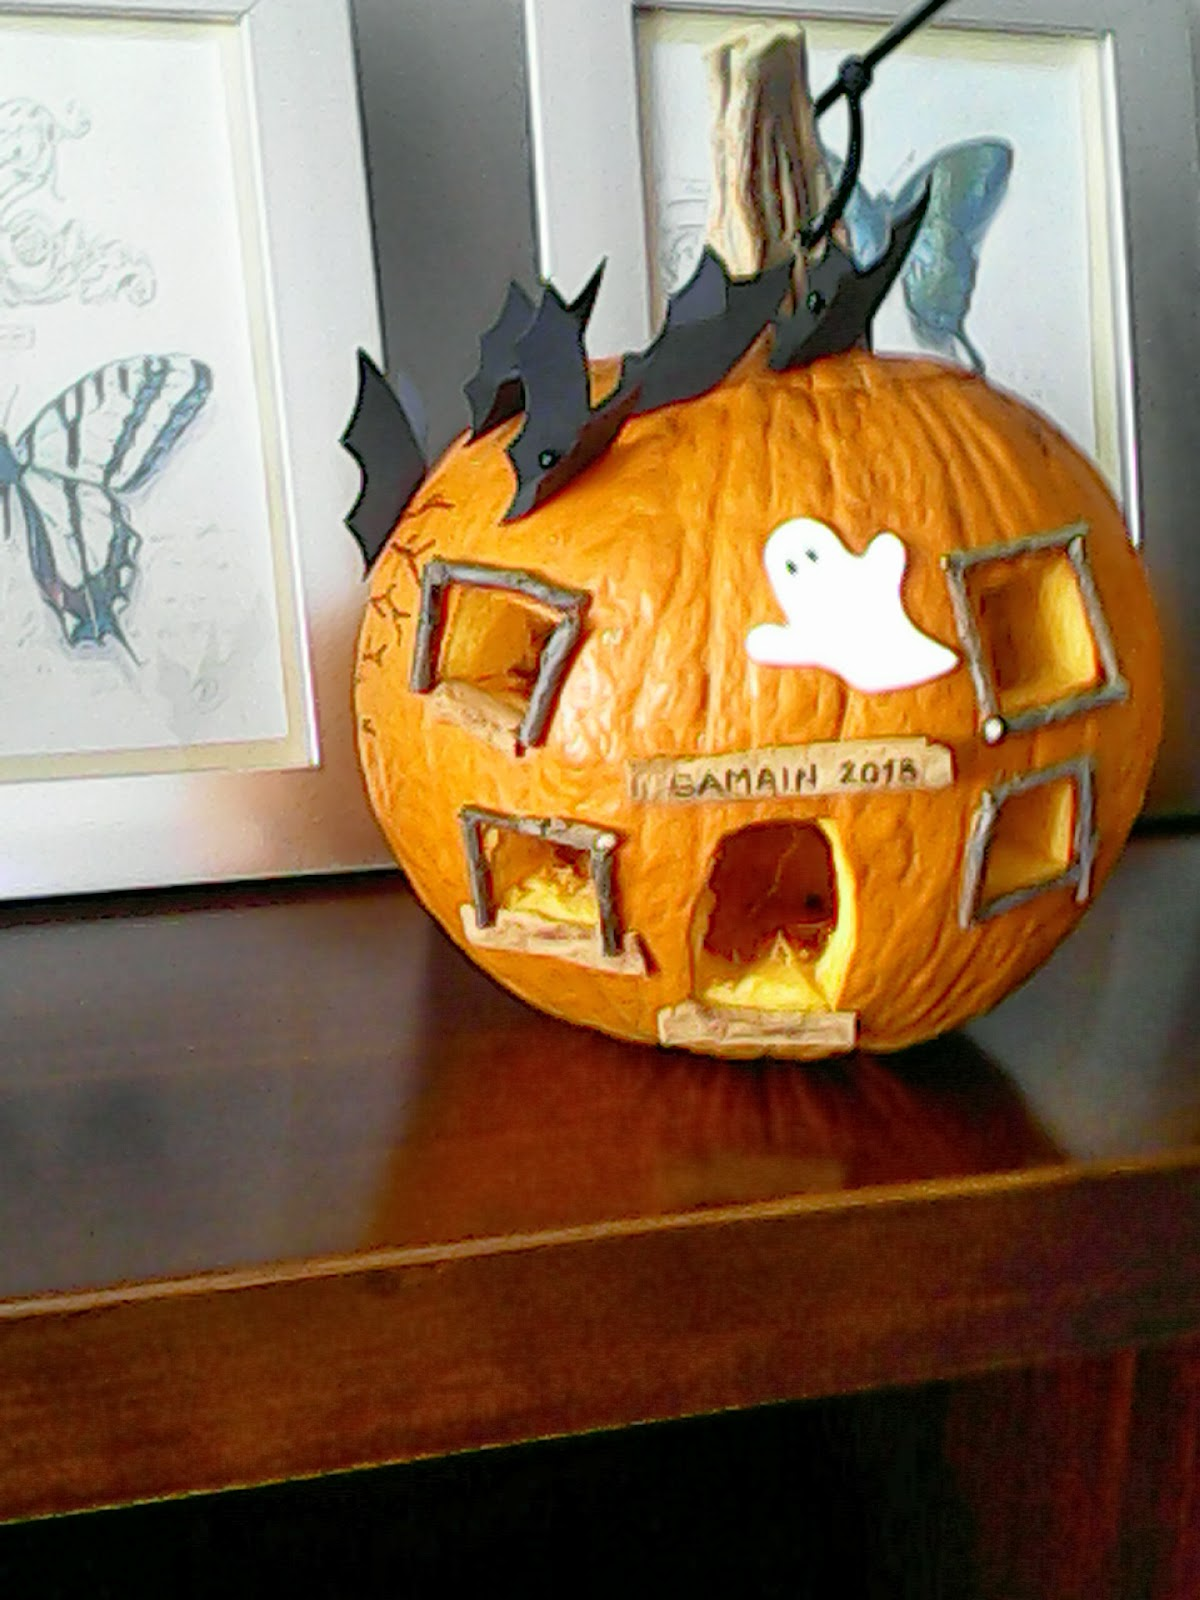 Calabazas decoradas de halloween cosas de mam s y peques - Calabazas de halloween de miedo ...